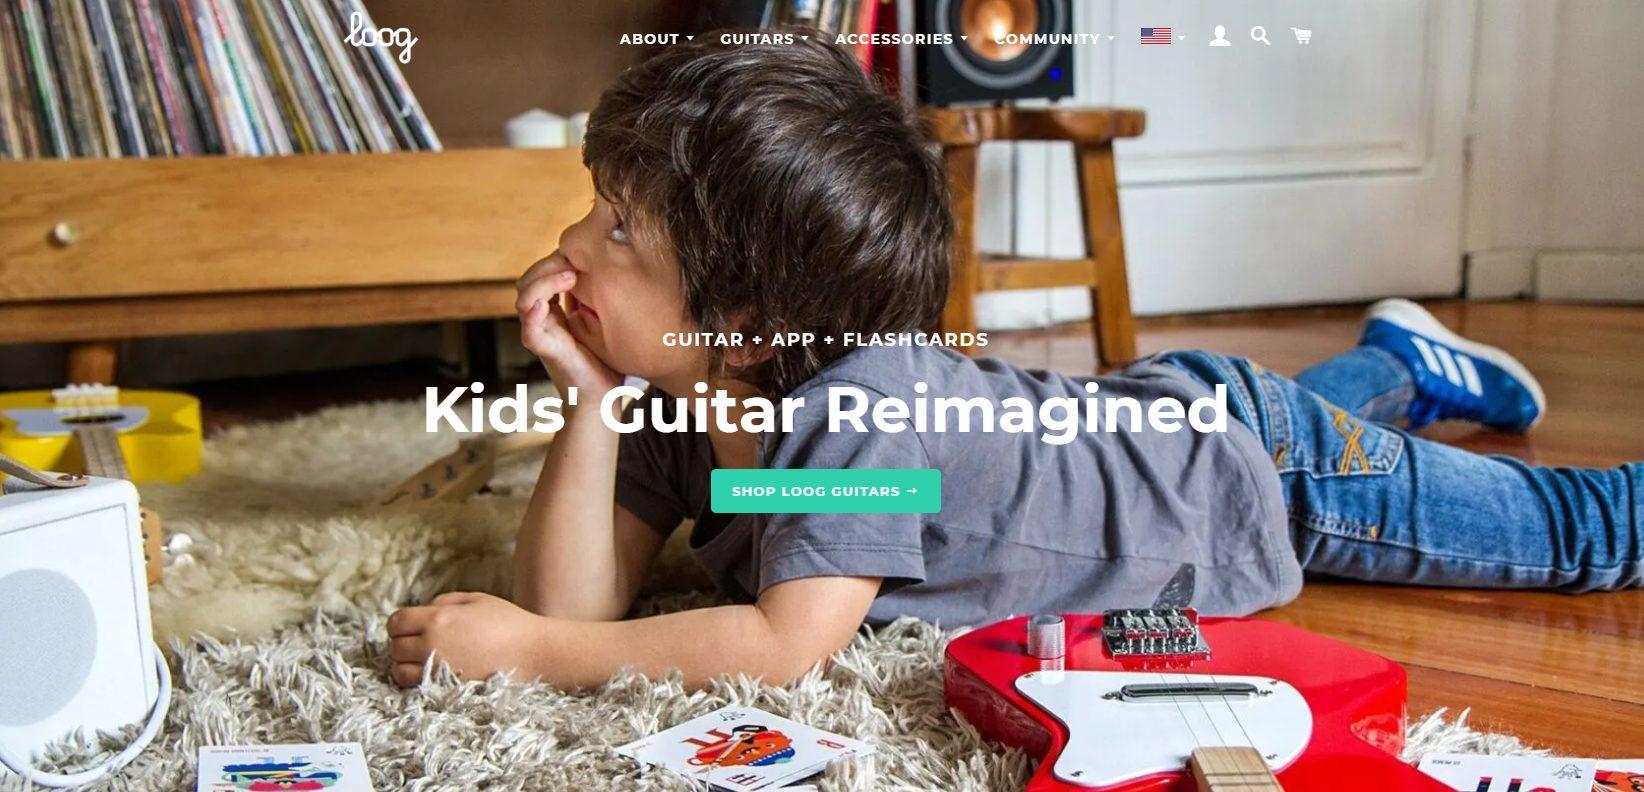 Loog Guitars Home Page